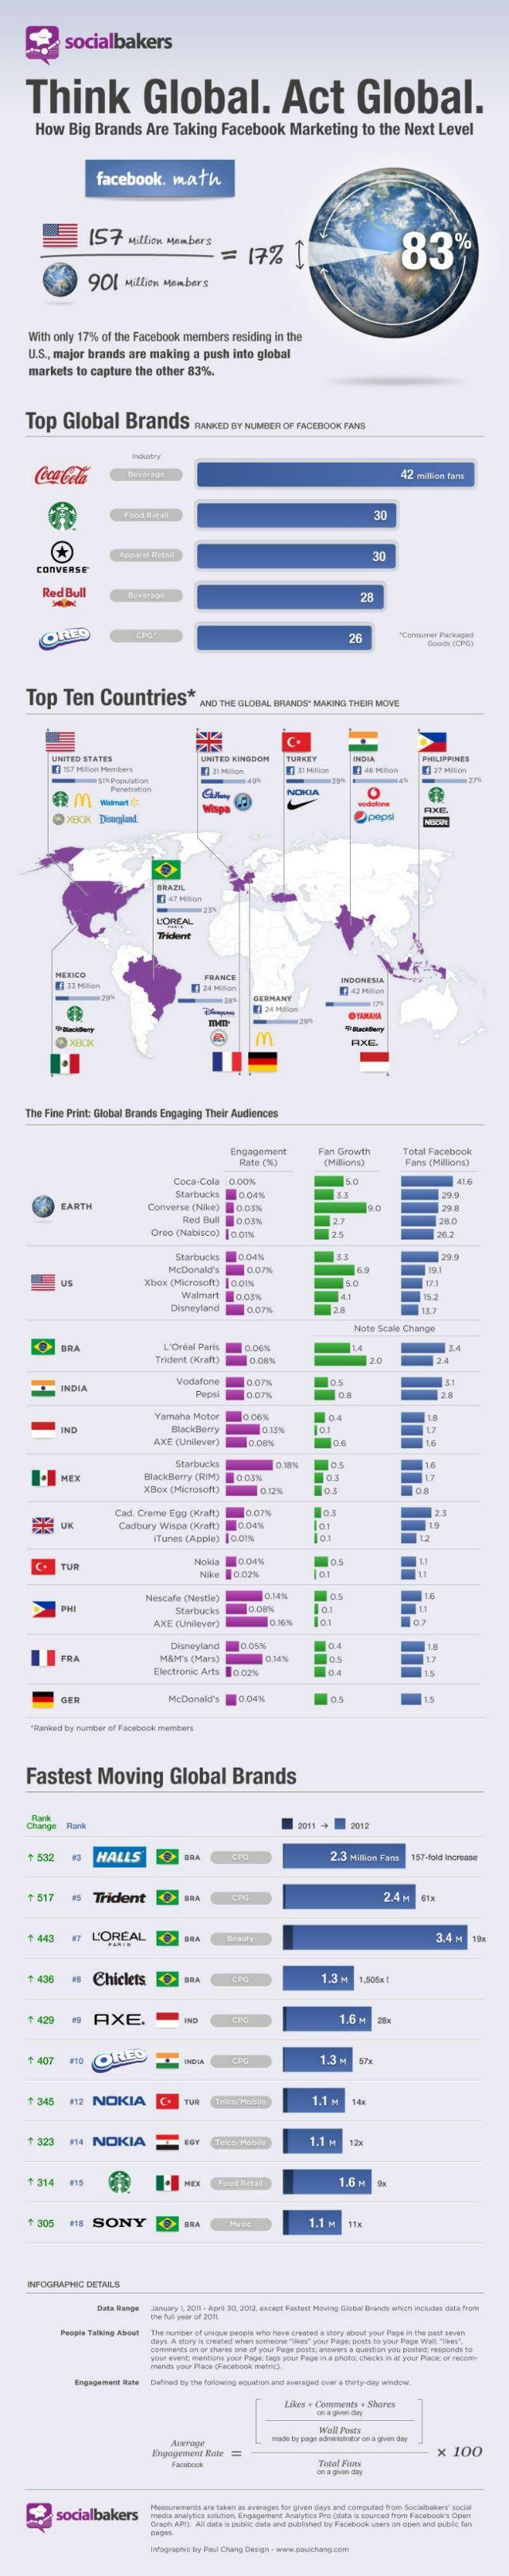 Marcas más influyentes en #Facebook #infografia